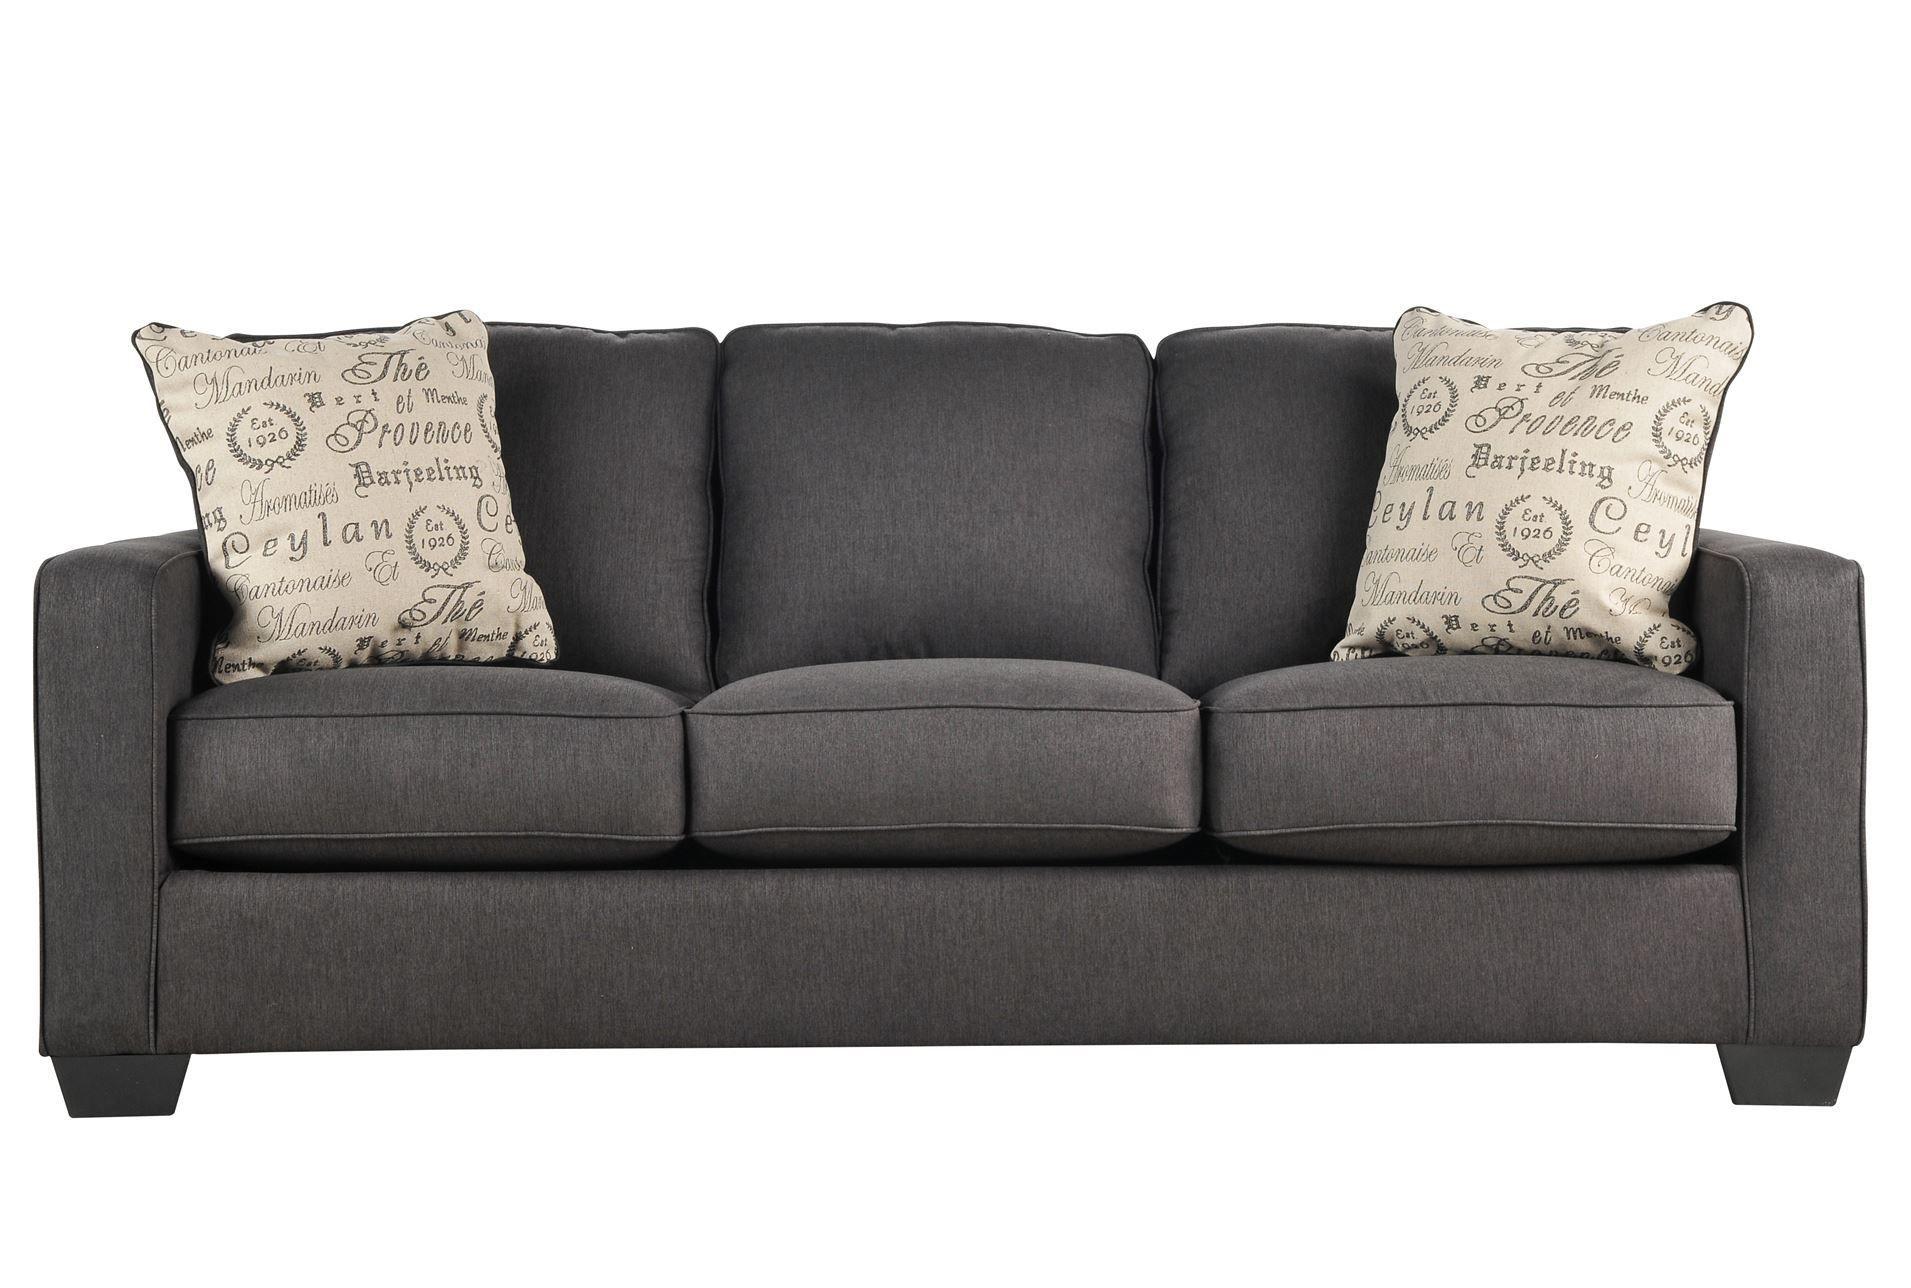 Charcoal Sofa On Pinterest Sofa Sleeper Charcoal Couch